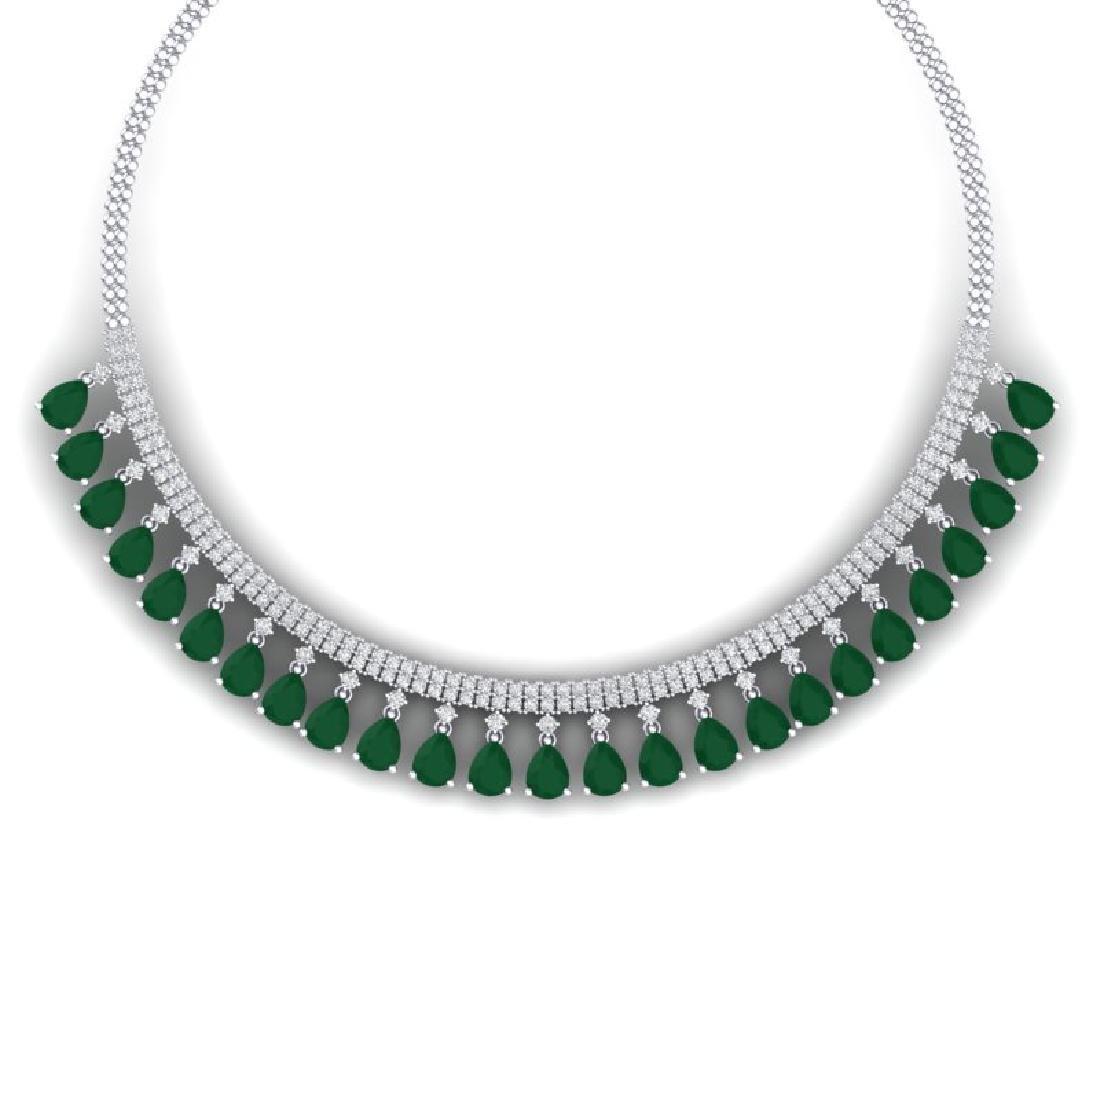 51.75 CTW Royalty Emerald & VS Diamond Necklace 18K